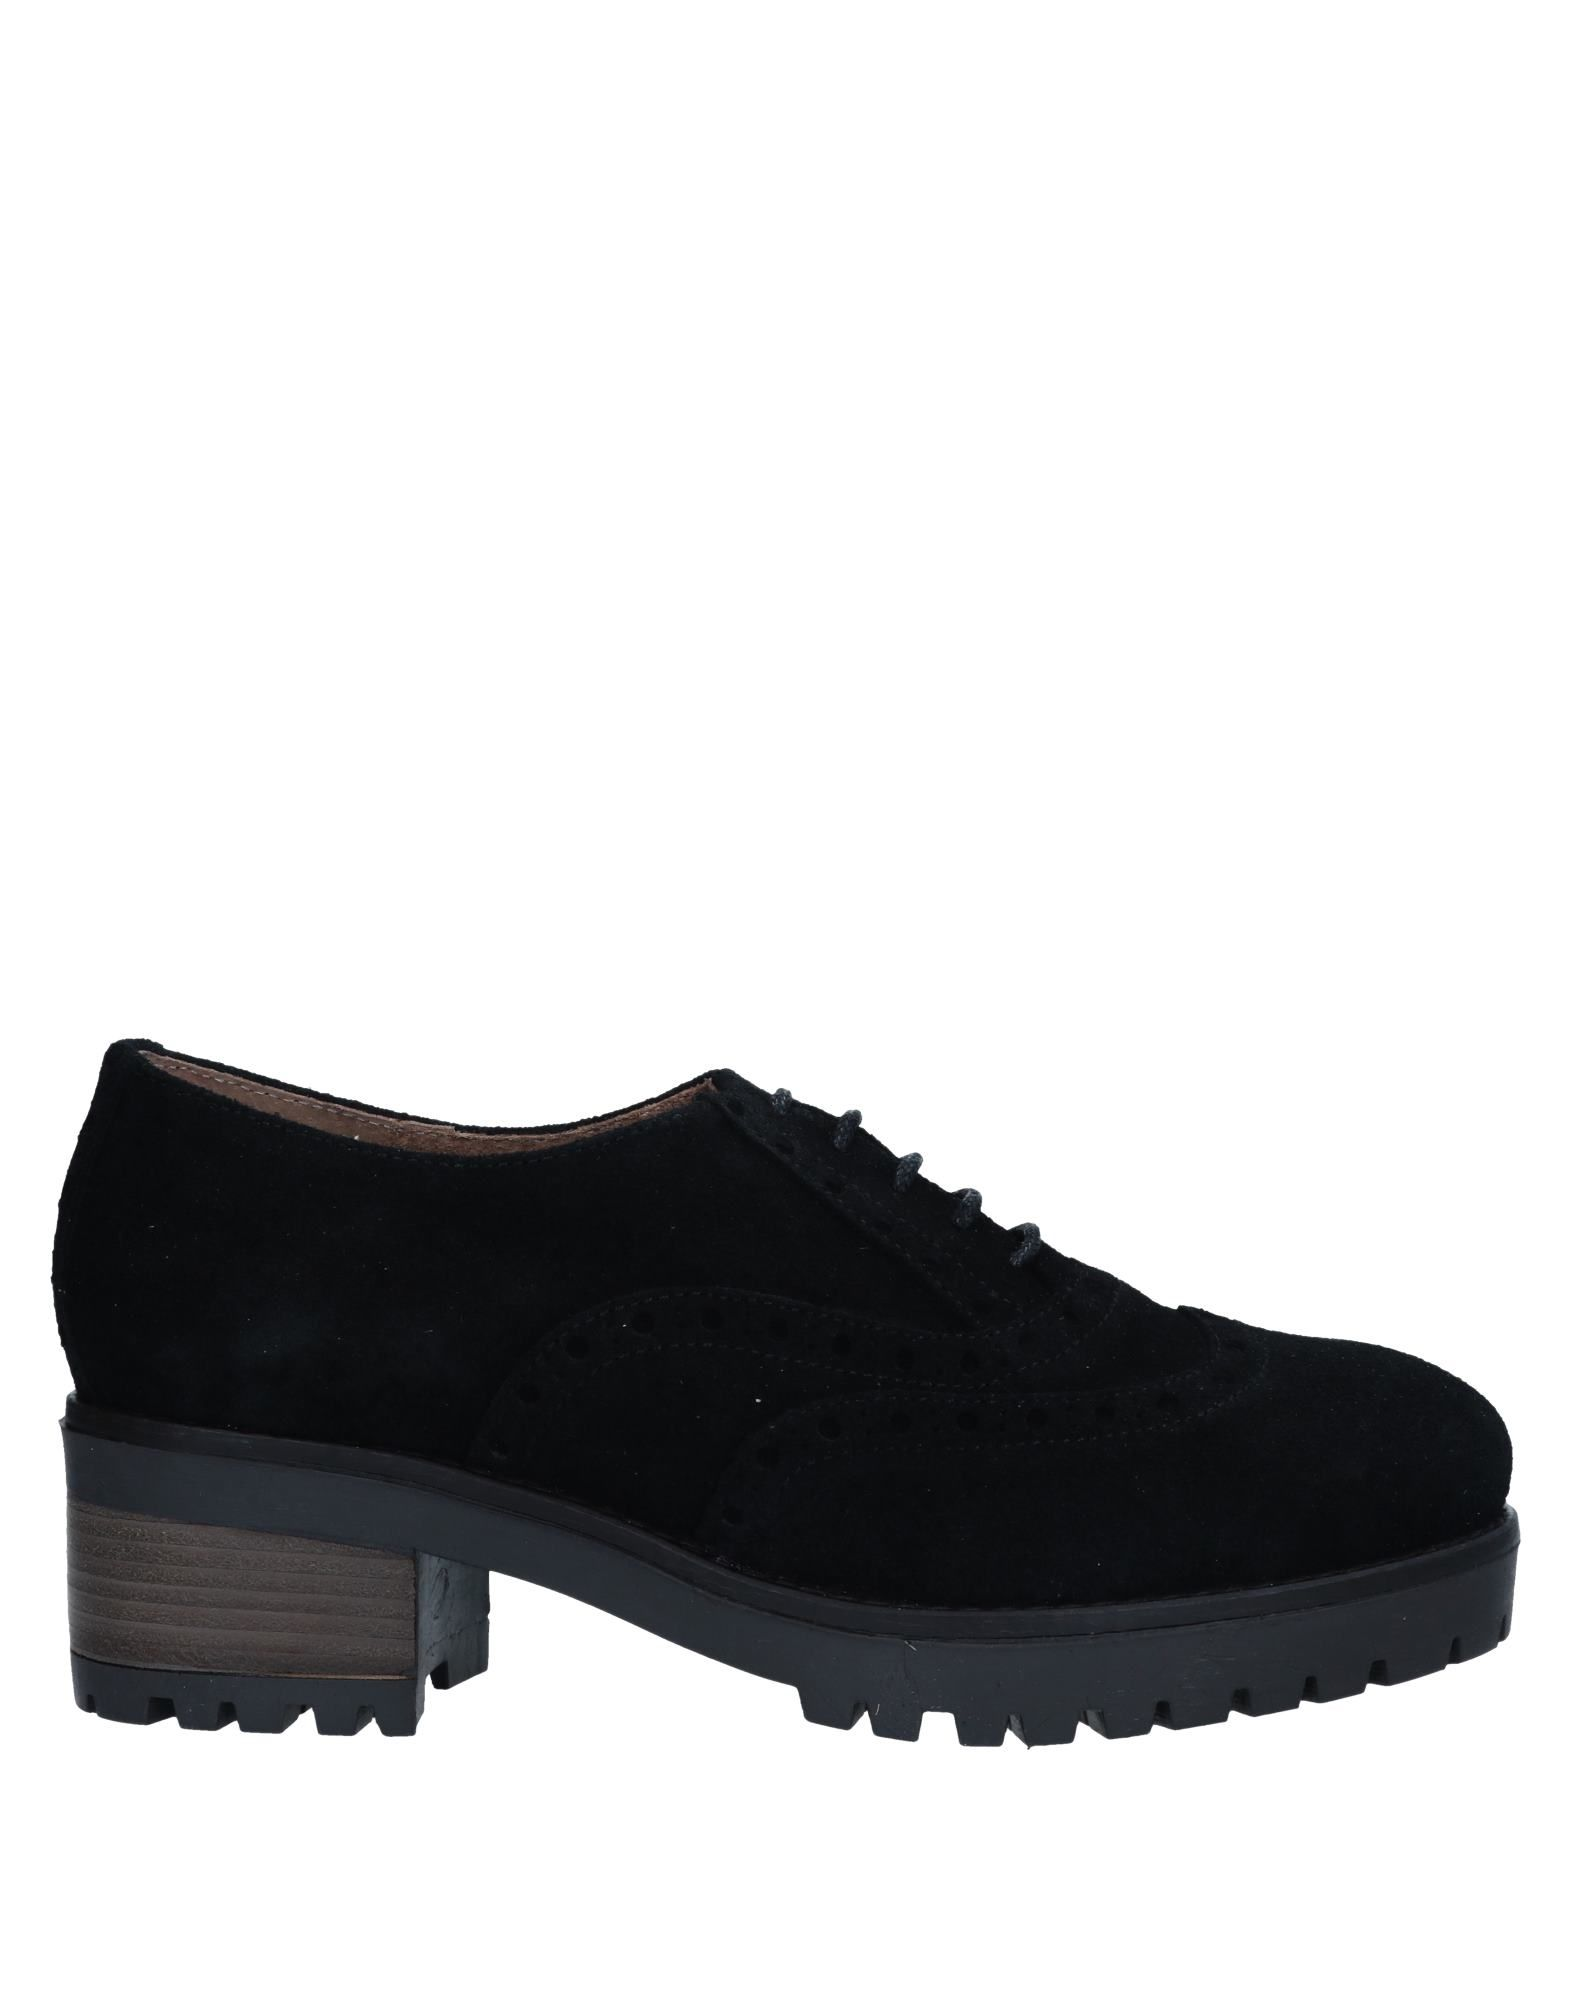 Flavio Creation Schnürschuhe Damen  11544697AH Gute Qualität beliebte Schuhe